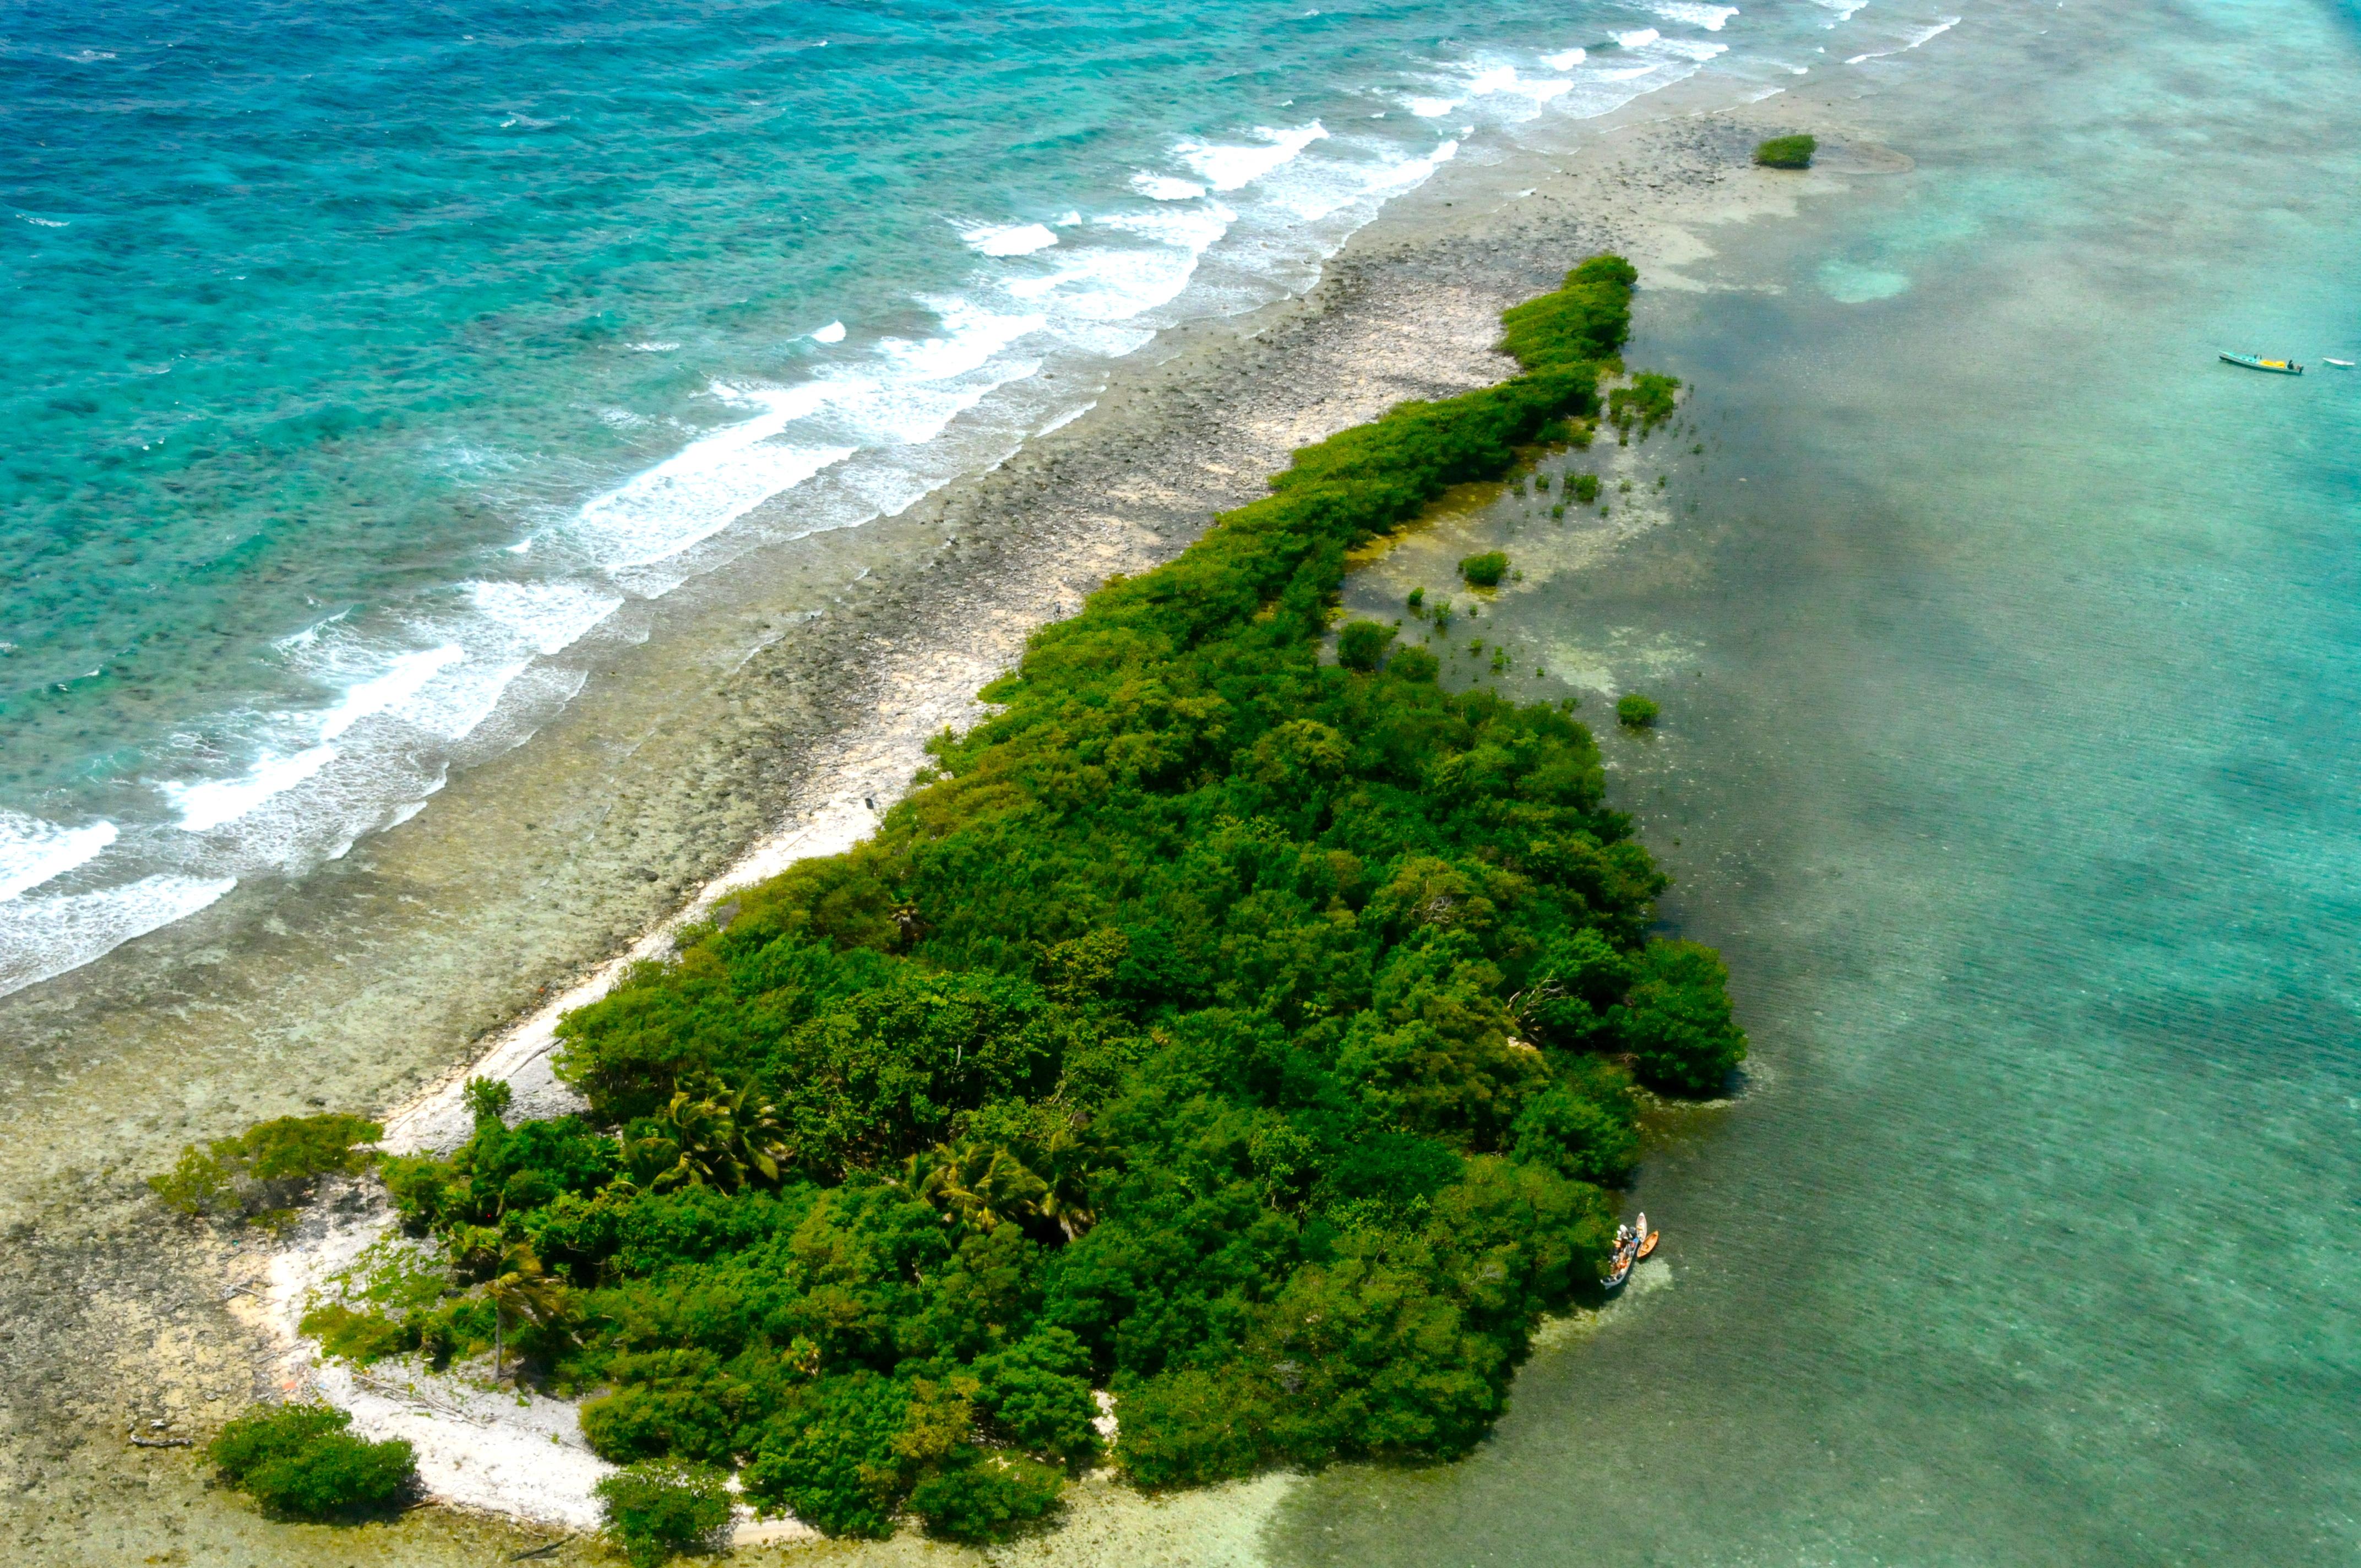 Soldier Caye - Belize, Central America - Private Islands for Sale